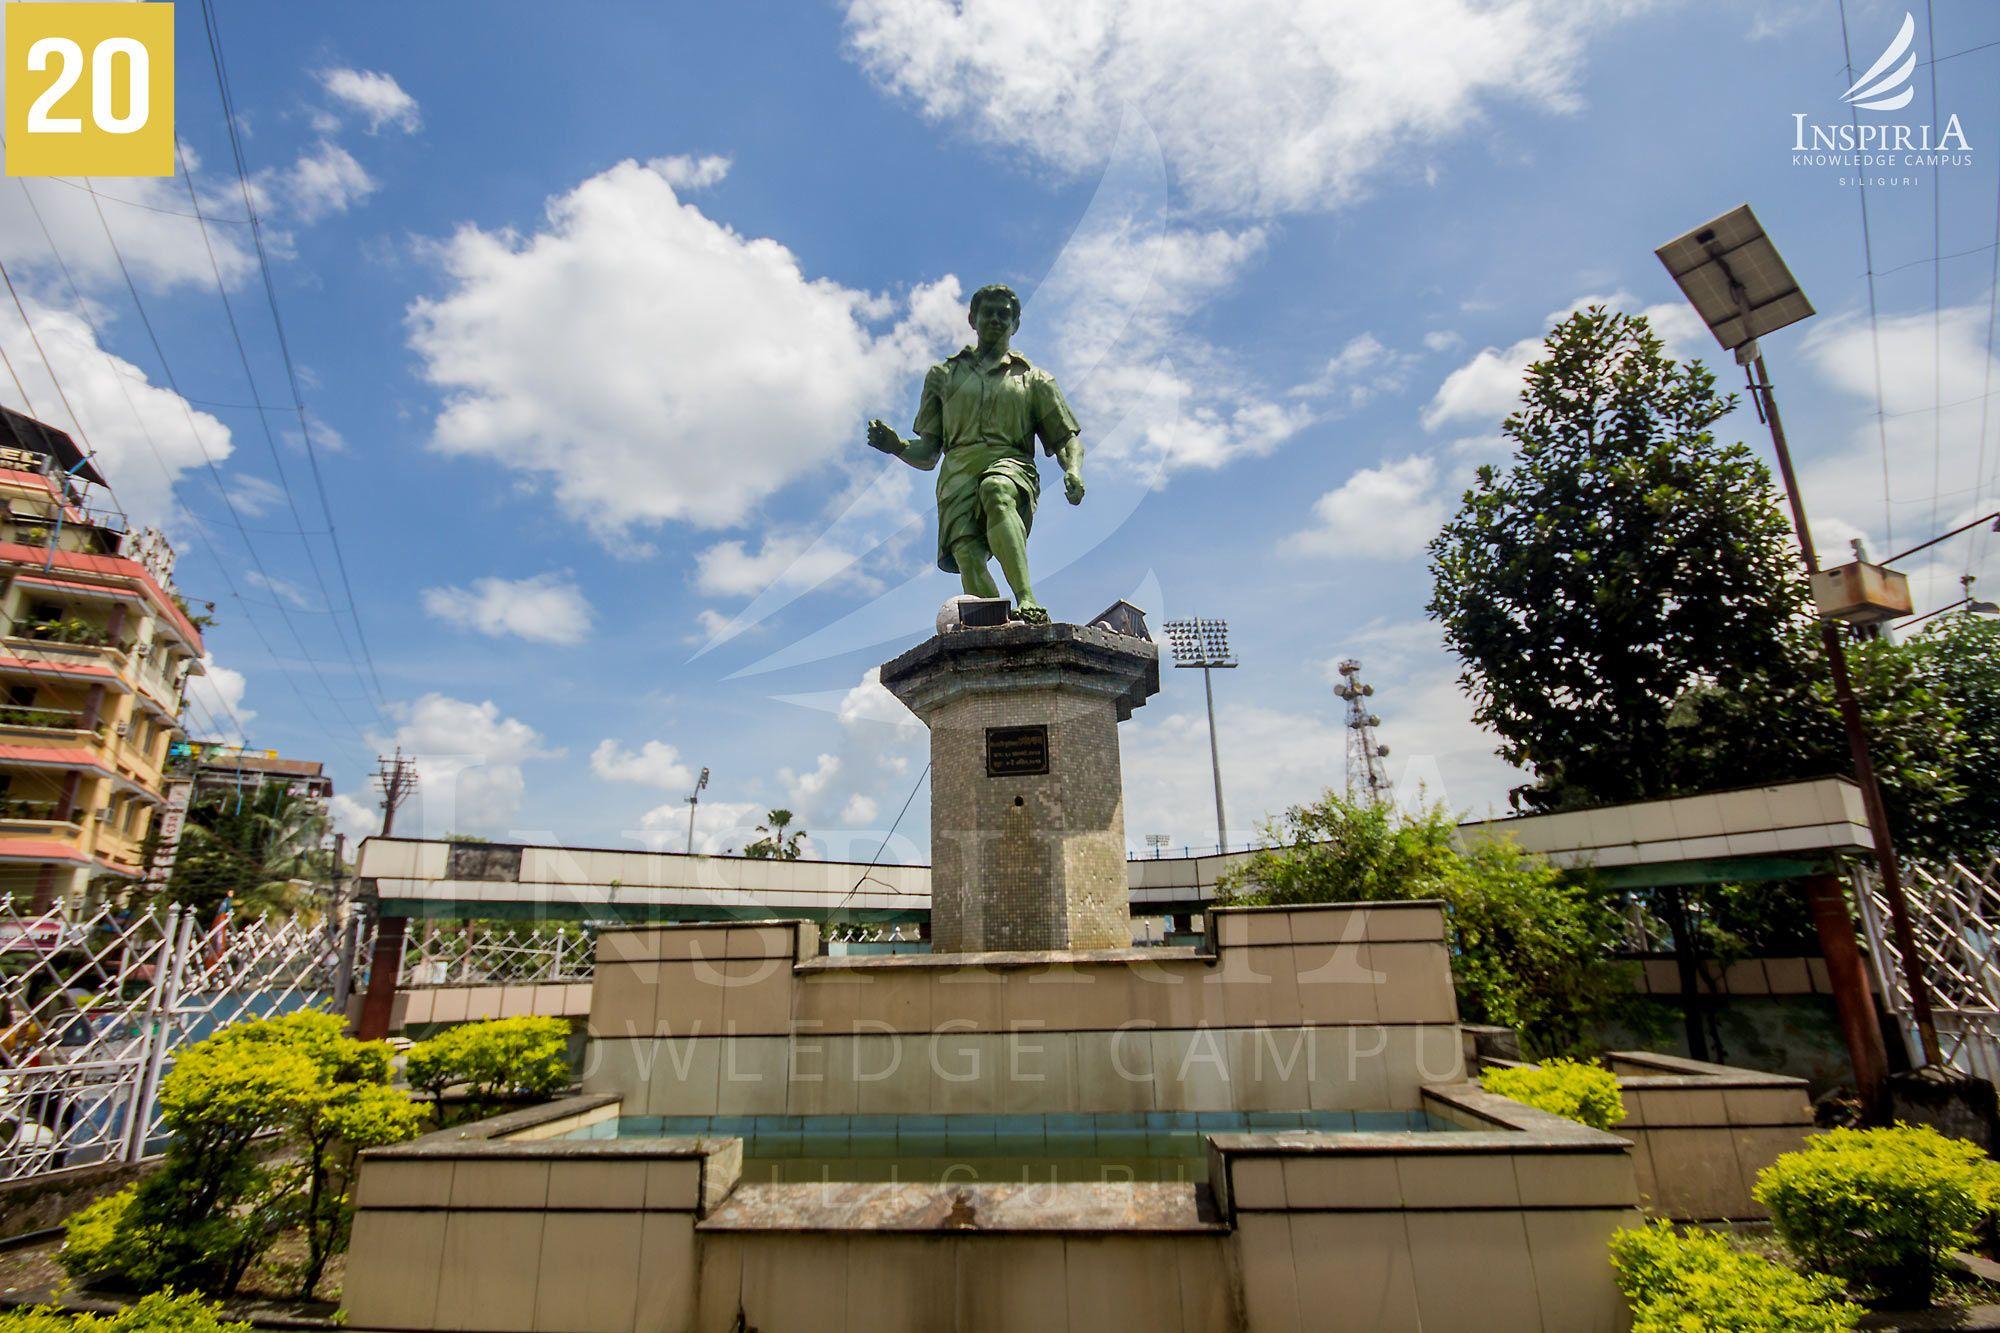 gesto-paul-statue-kanchanjanga-stadium-siliguri-wb